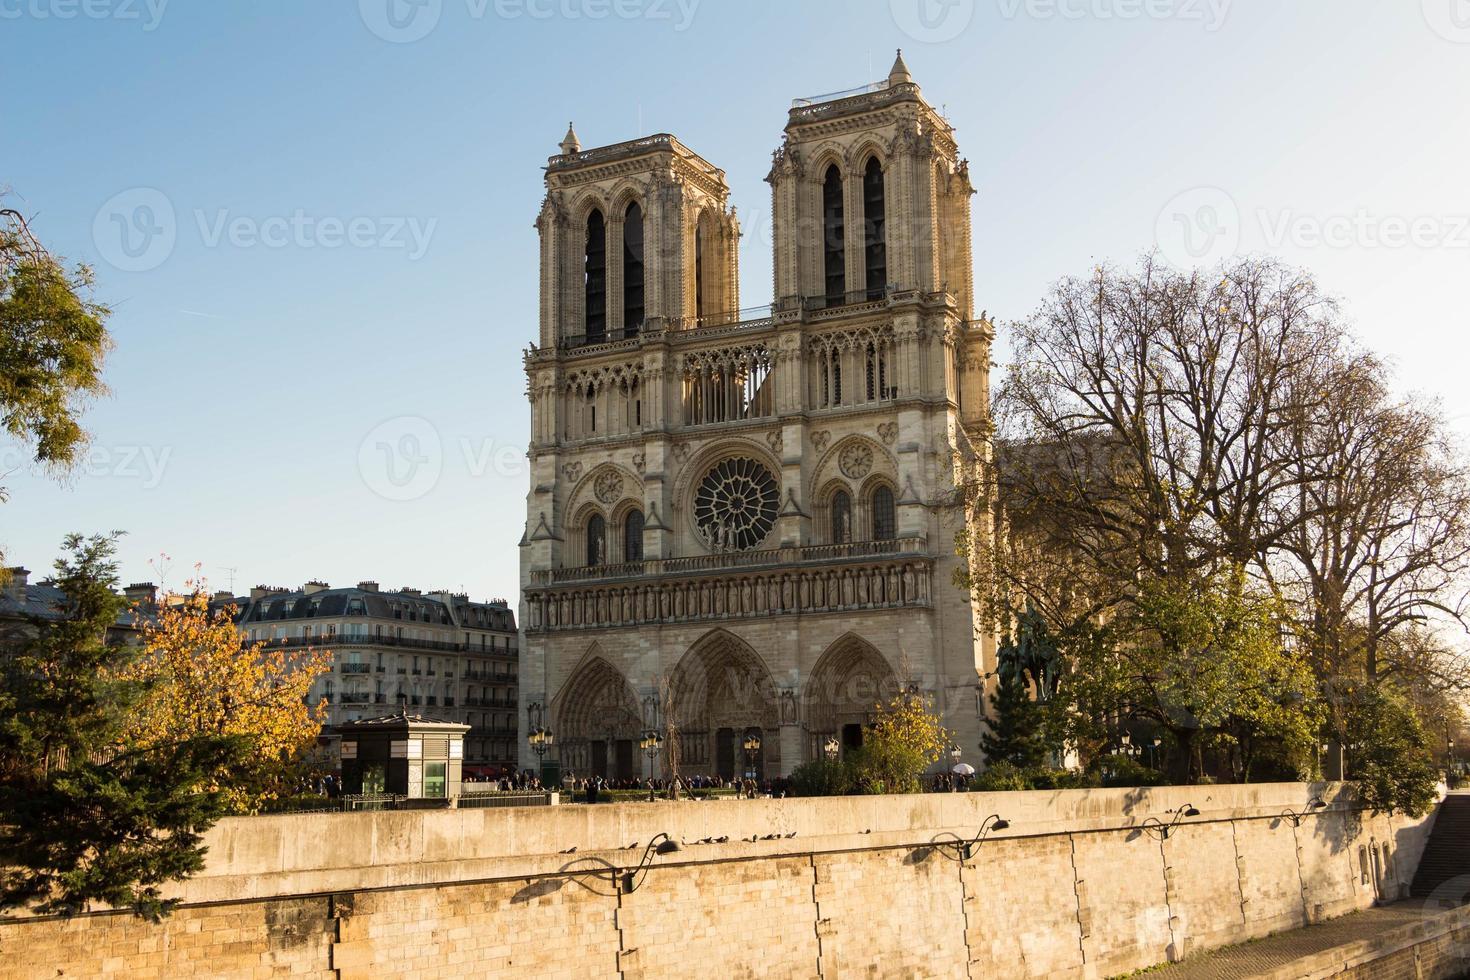 a catedral de notre dame, paris, frança. foto